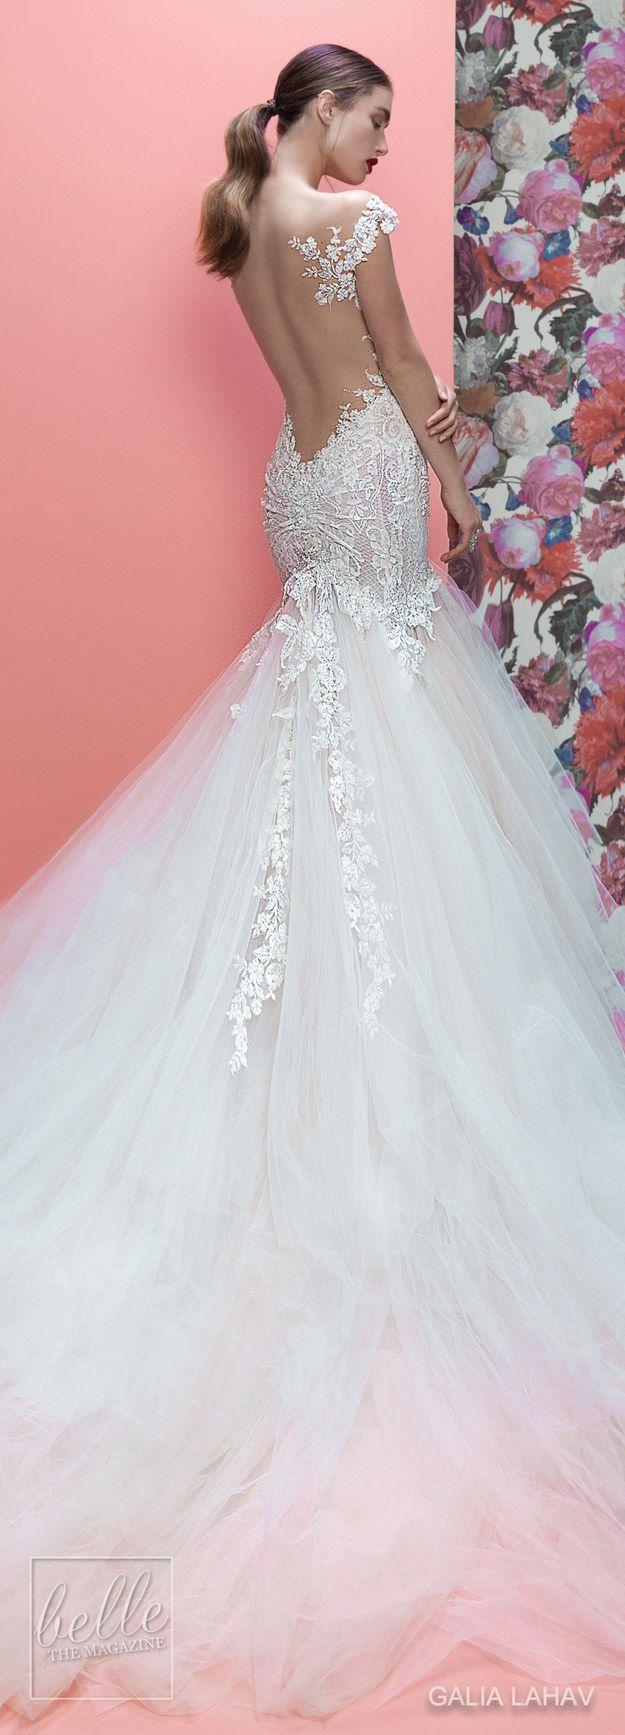 Lace dress in black august 2019  best Vestido novia images on Pinterest  Dress wedding Perfect